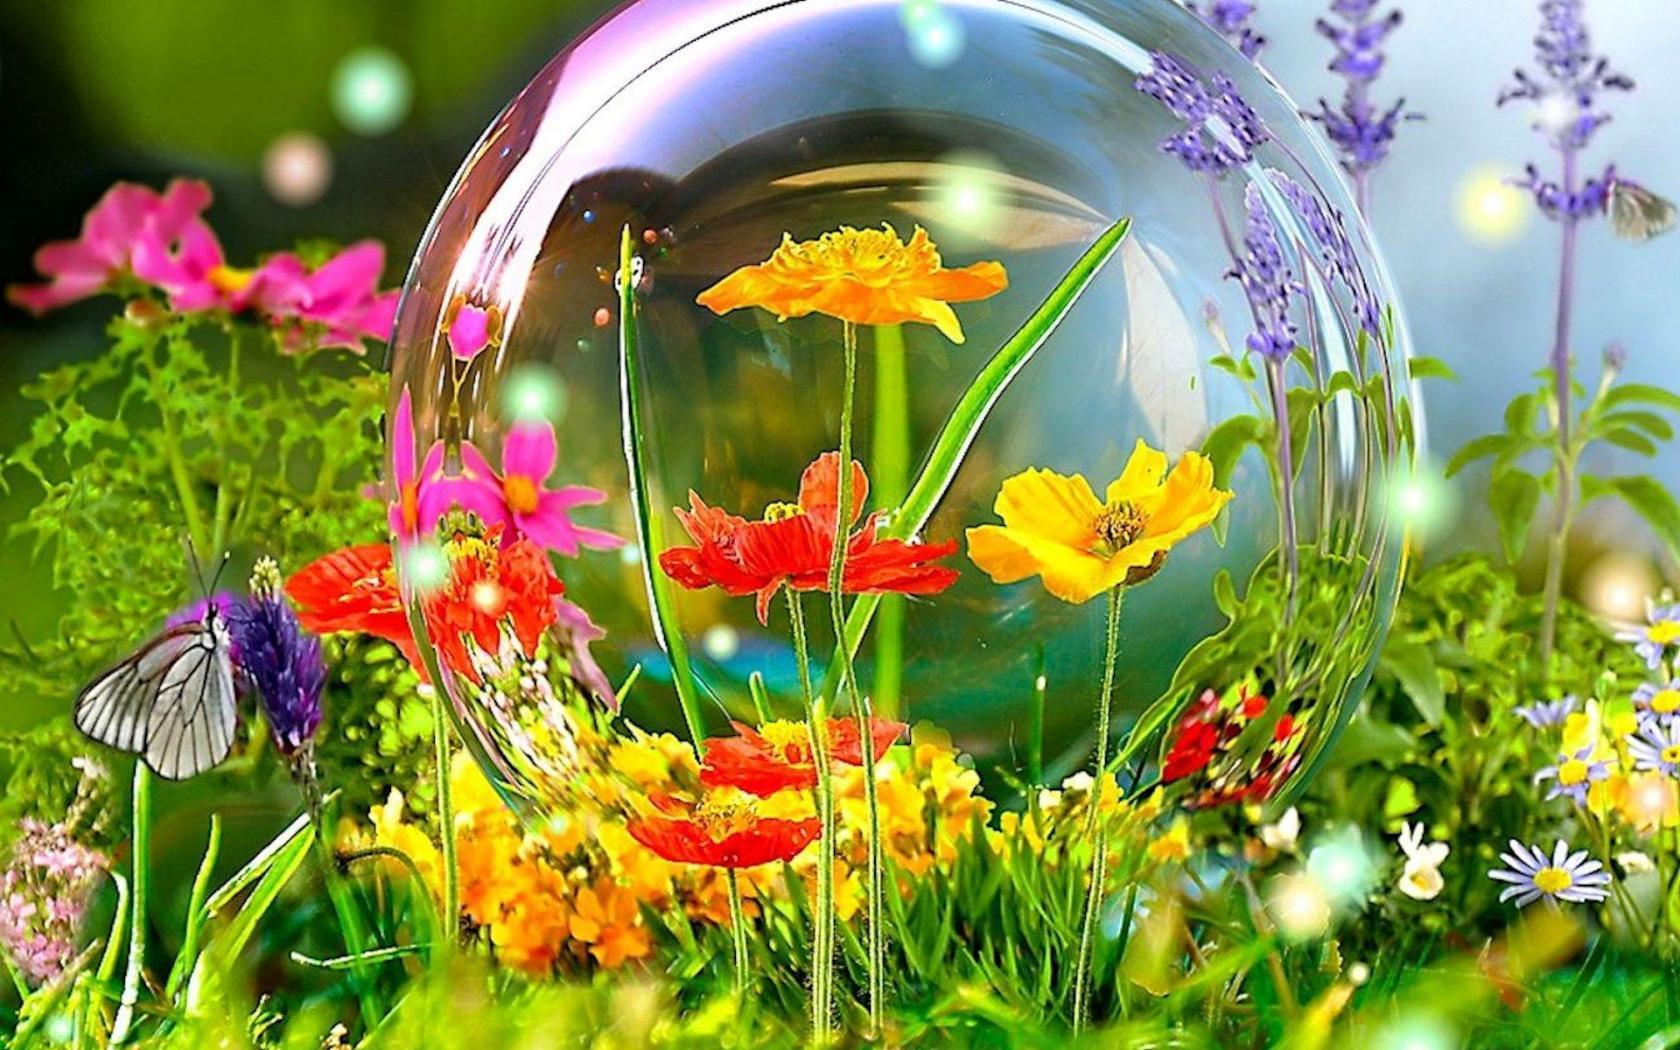 Spring Wallpaper Widescreen HD Wallpapers on picsfaircom 1680x1050